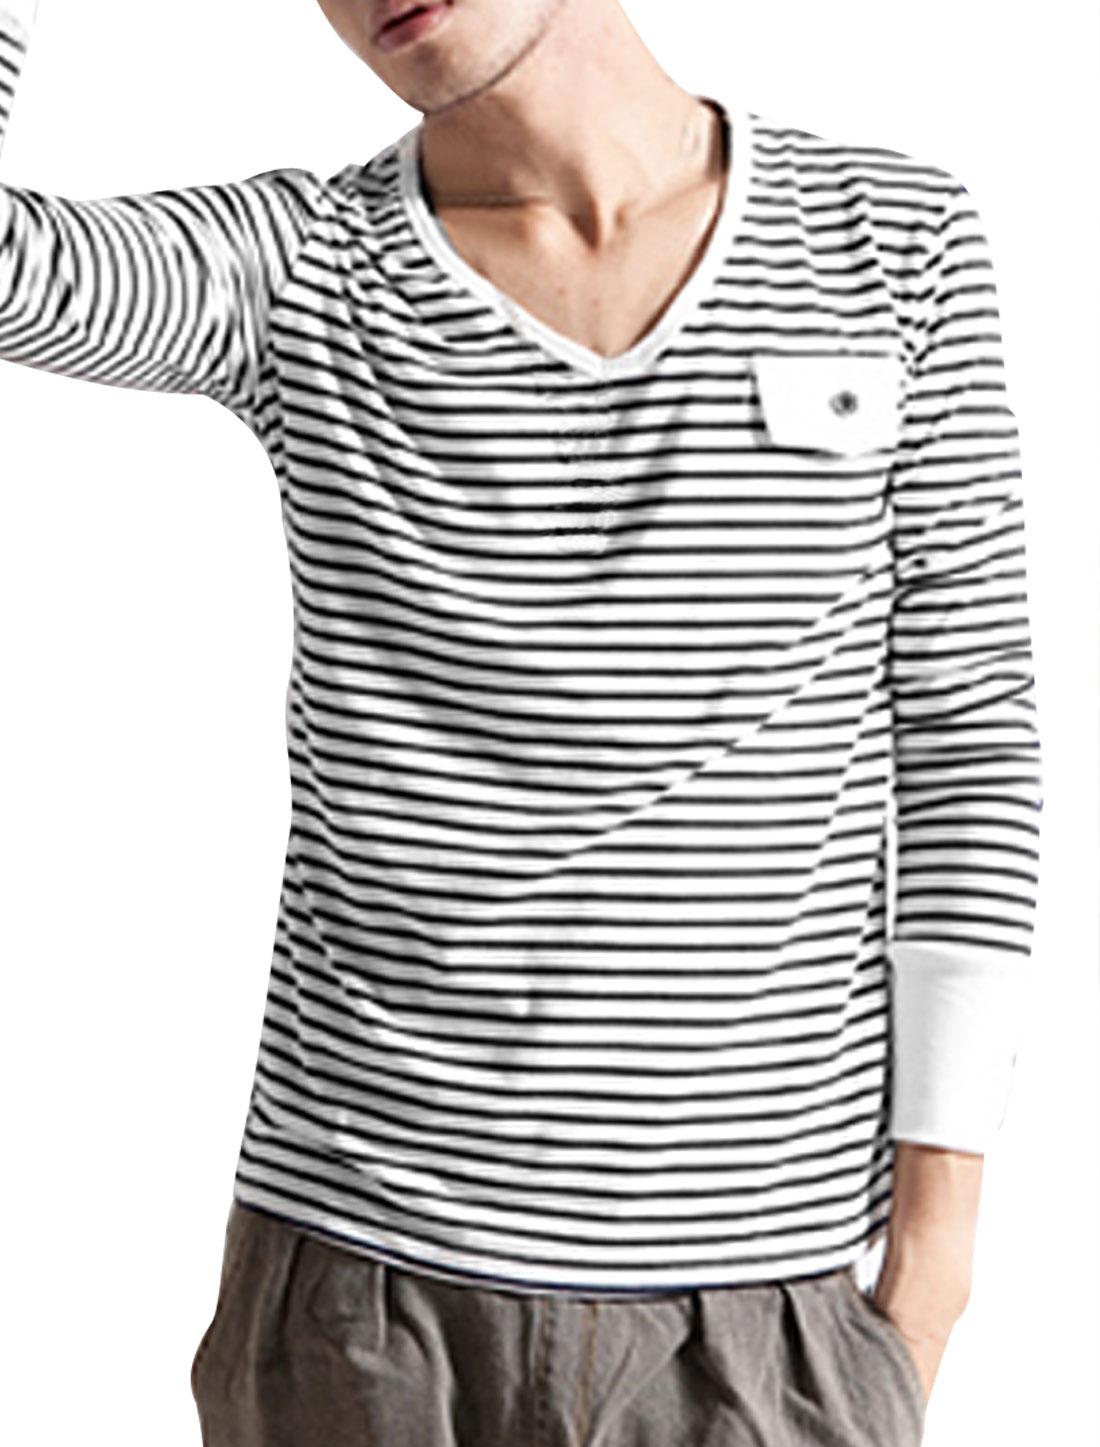 Mens Stylish Stripe Sailor V Neck Casual T-Shirt Shirt Black White S